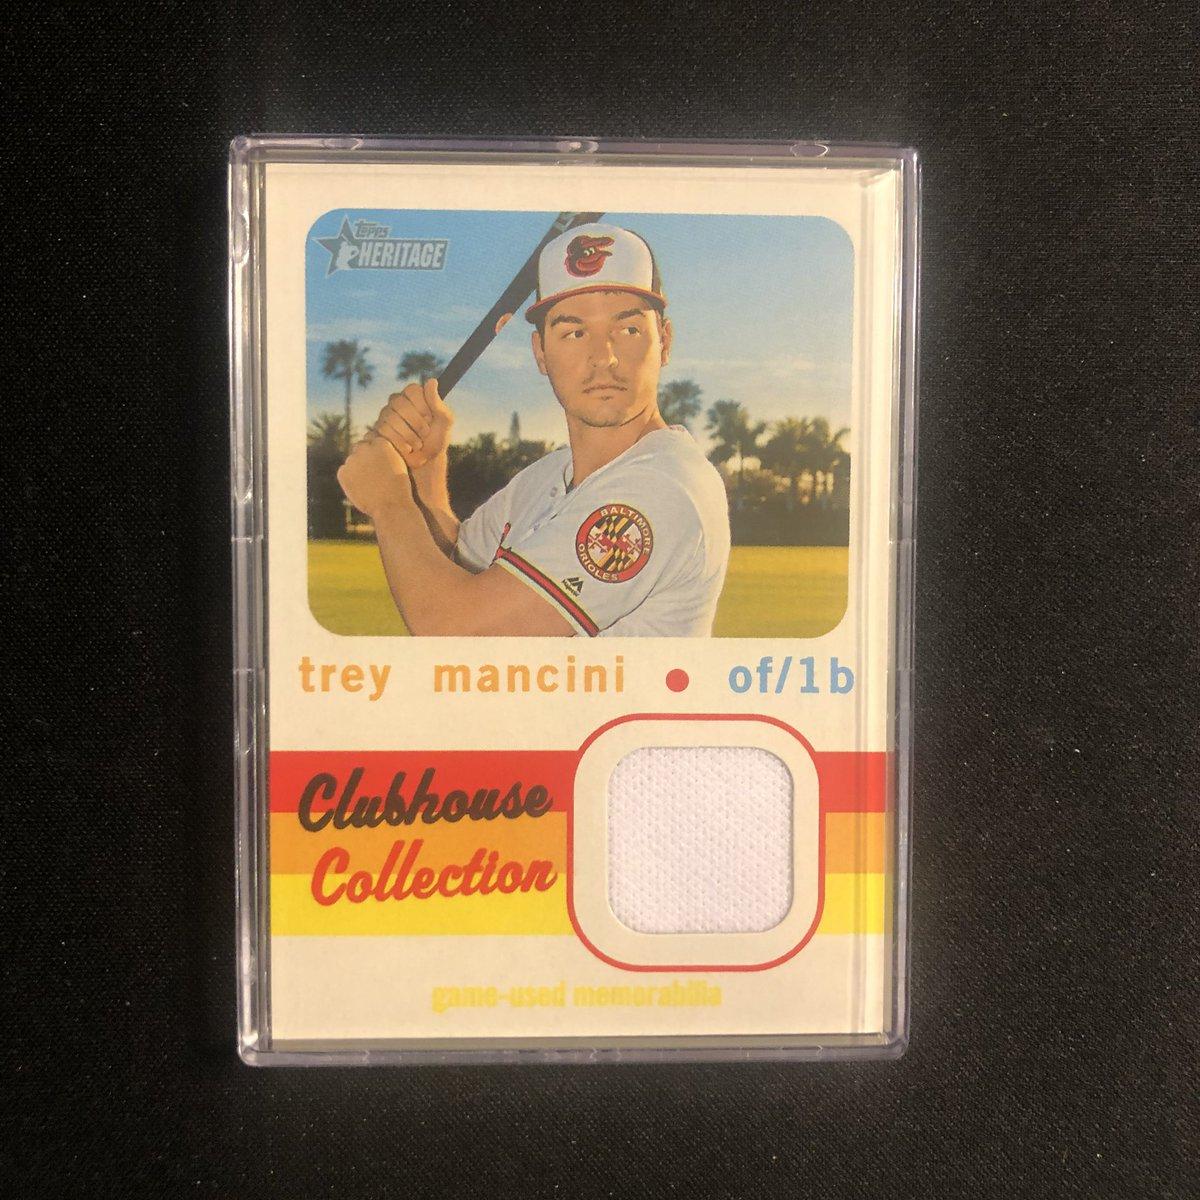 Lot 16 - Trey Mancini 2020 Topps Heritage Clubhouse Collection Relic (CCR-TM) $1.00 #baseballcards #baseballcardsforsale <br>http://pic.twitter.com/CVIg3RYCsP